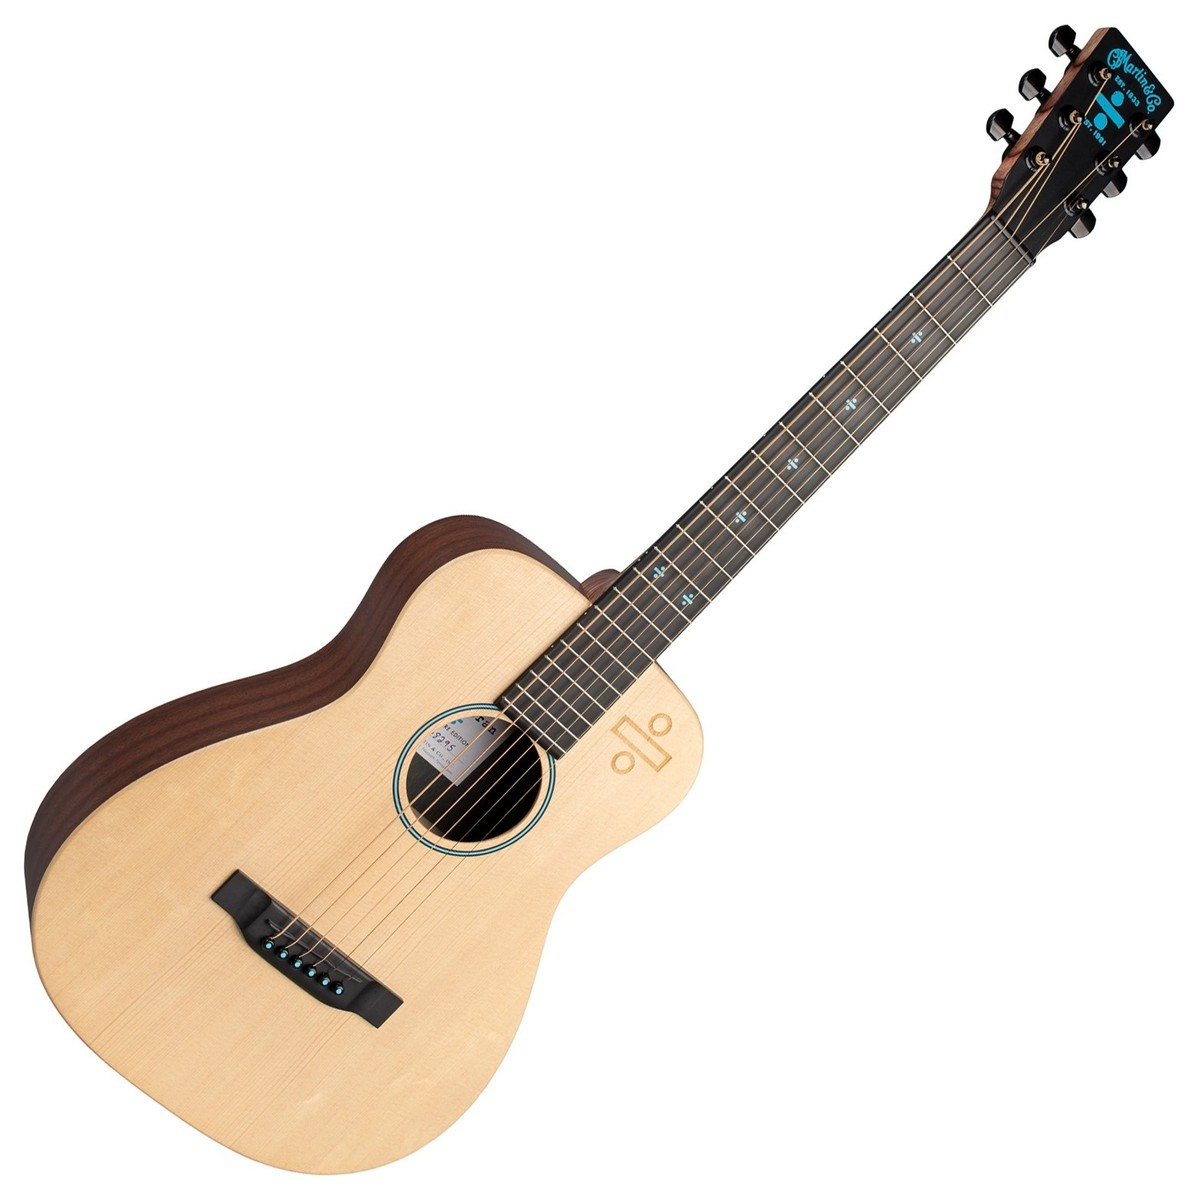 martin lx1 ed sheeran signature guitar divide model music world. Black Bedroom Furniture Sets. Home Design Ideas